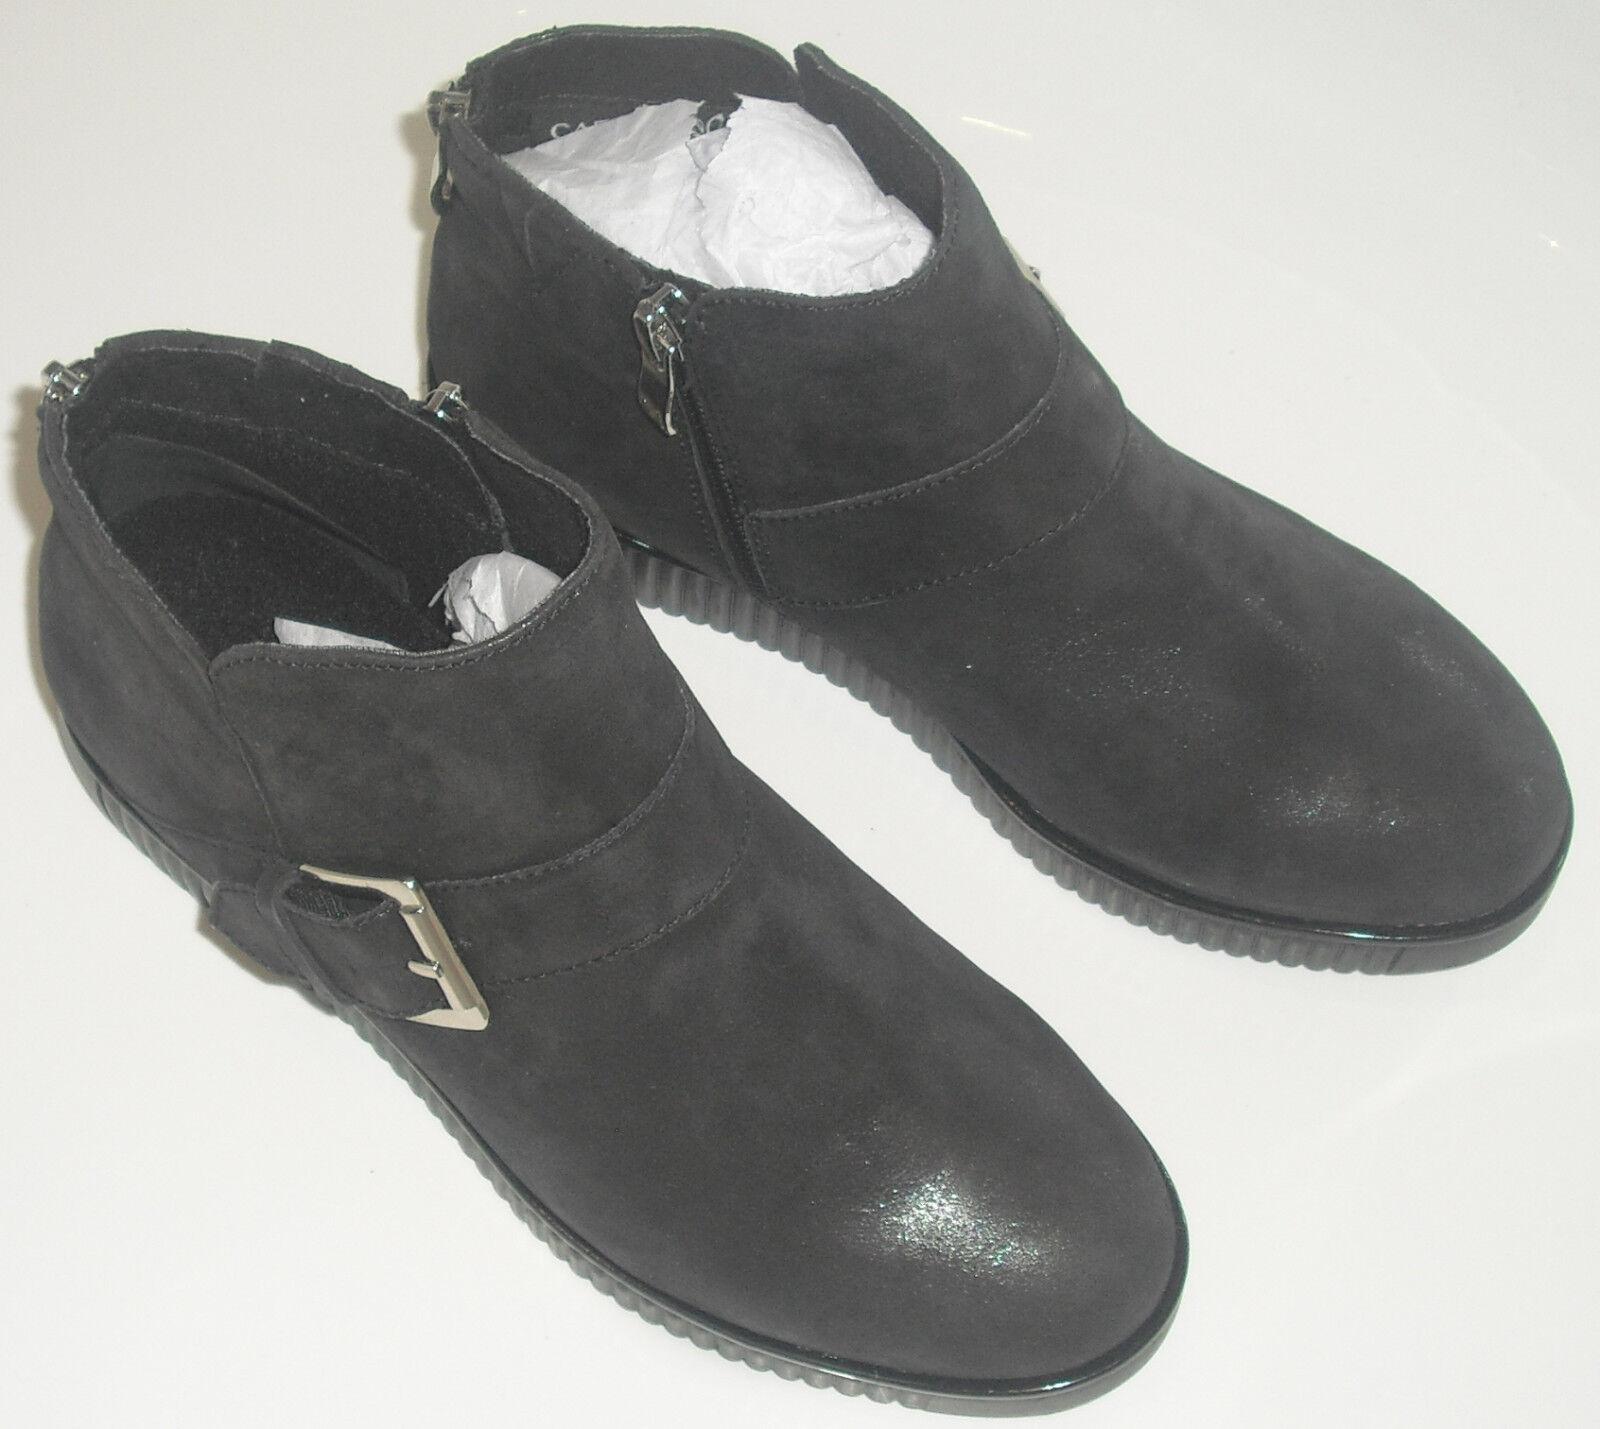 Caprice Schuhe Stiefelette BLACK SUEDE gr.37